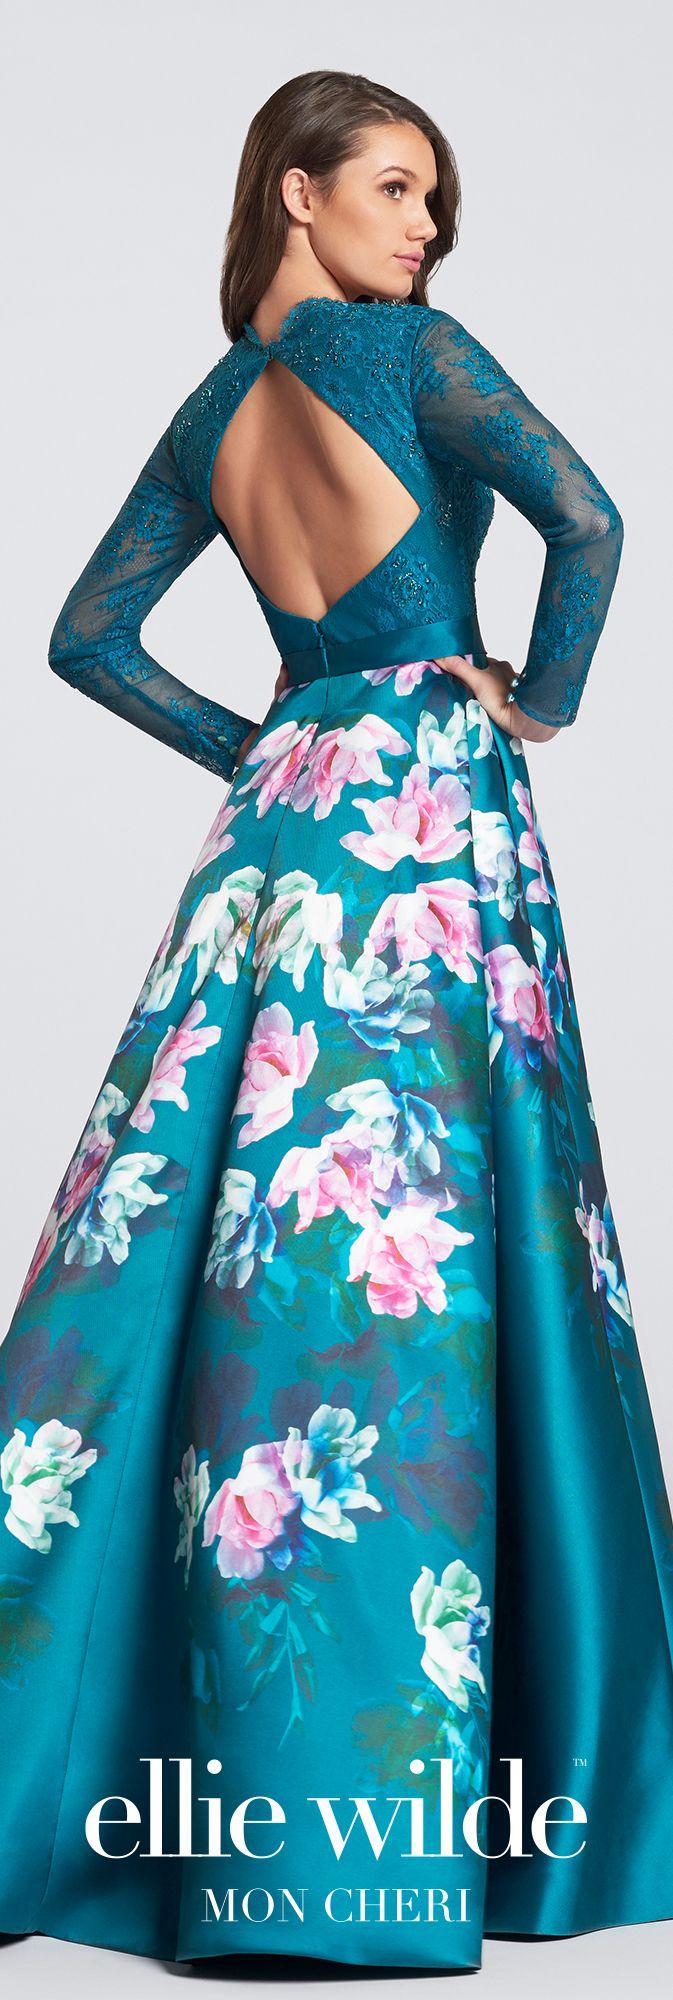 Long sleeve lace bodice floral print prom dress. A-line gown, plunging V-neckline, large keyhole back, Mikado overskirt with side slit, short underskirt.